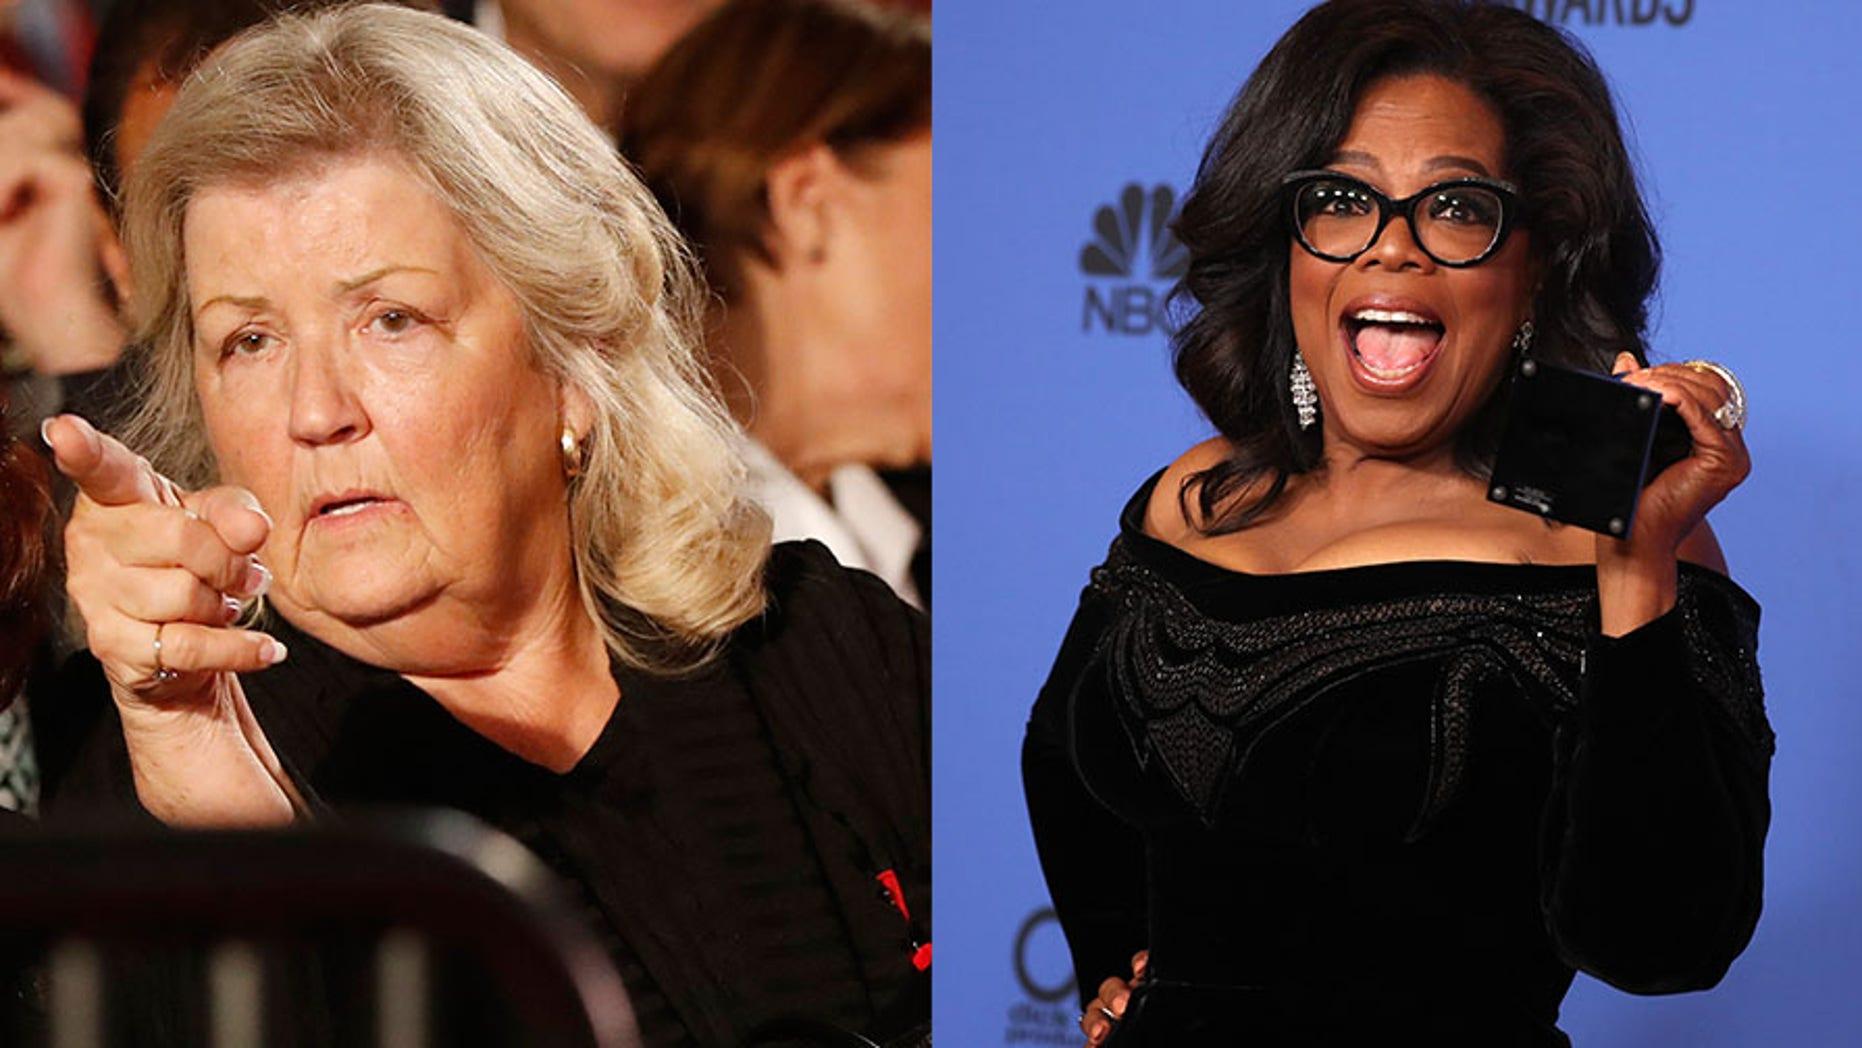 Juanita Broaddrick (left) slammed Oprah Winfrey's Golden Globes speech, claiming the celebrity talk show host ignored her claims that former President Bill Clinton raped her over 20 years ago.